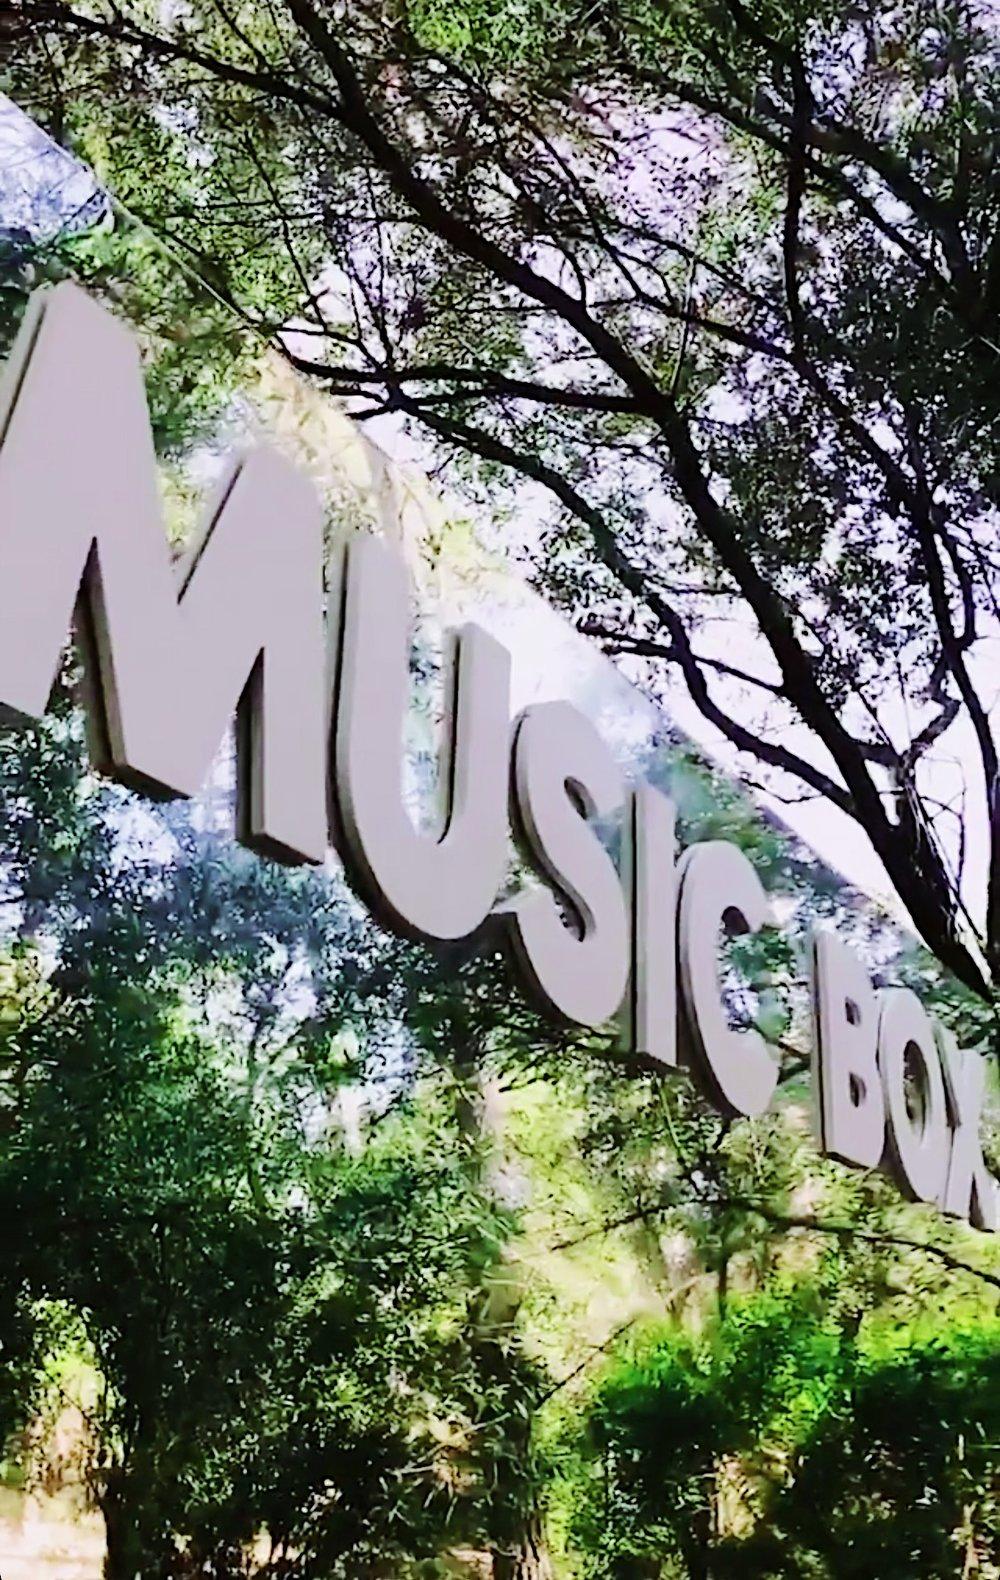 musicbox-vida-festivales-2019-27lletres.jpeg